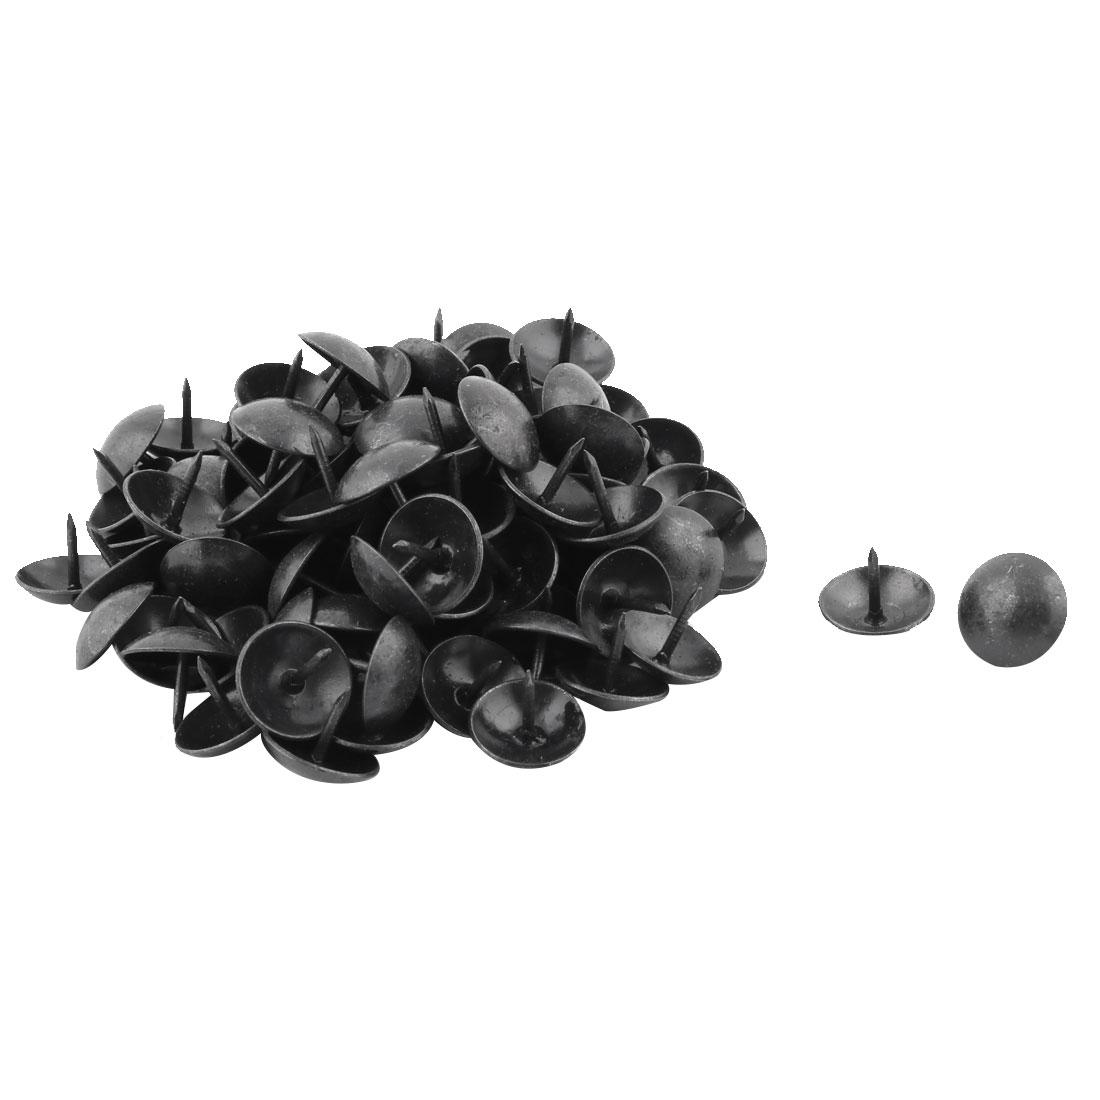 Furniture Case Metal Round Cap Upholstery Thumb Tack Nail Pushpin Black 16 x 12mm 100pcs